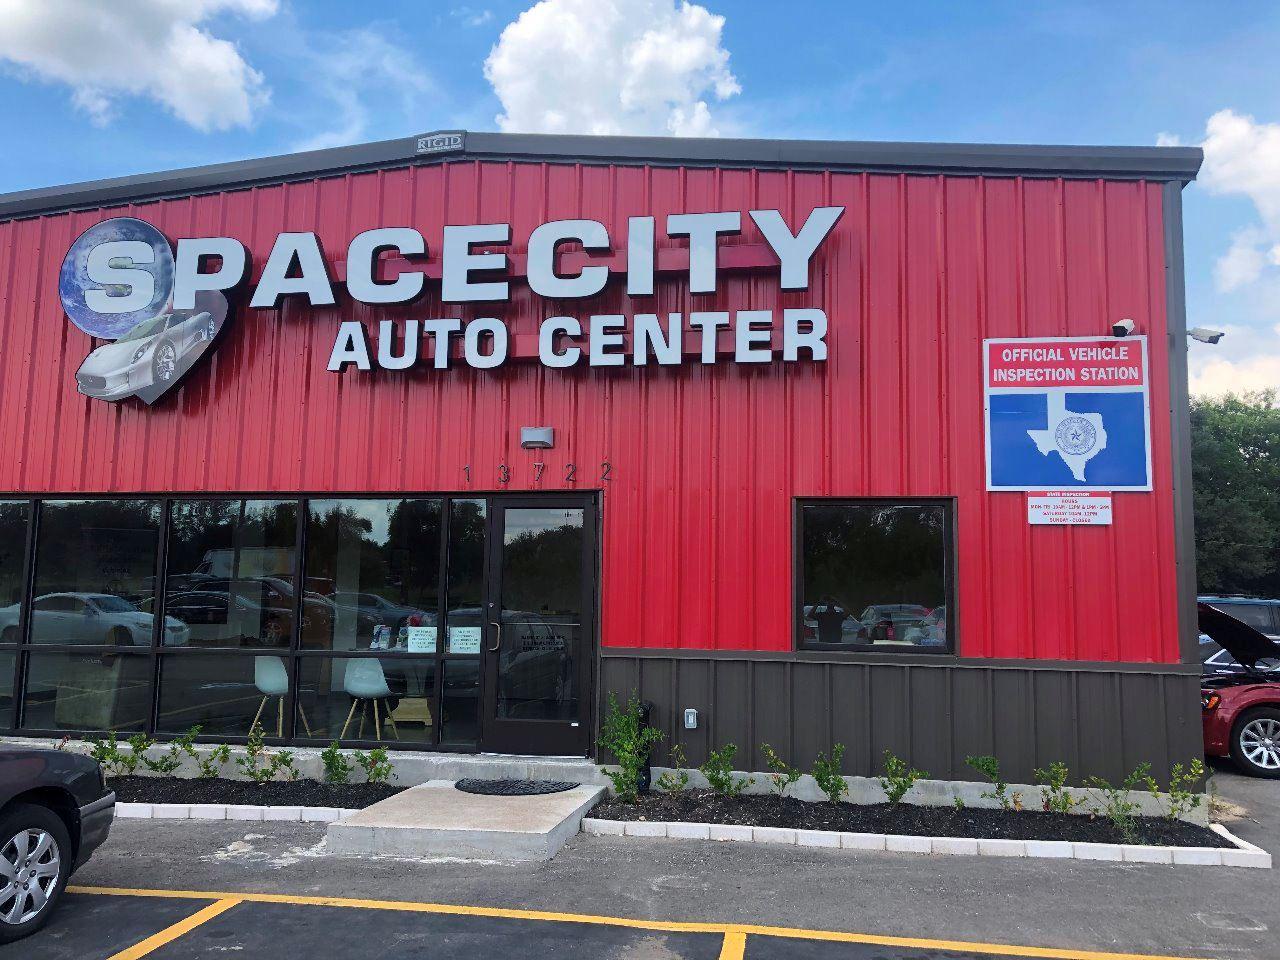 Space City Auto Center